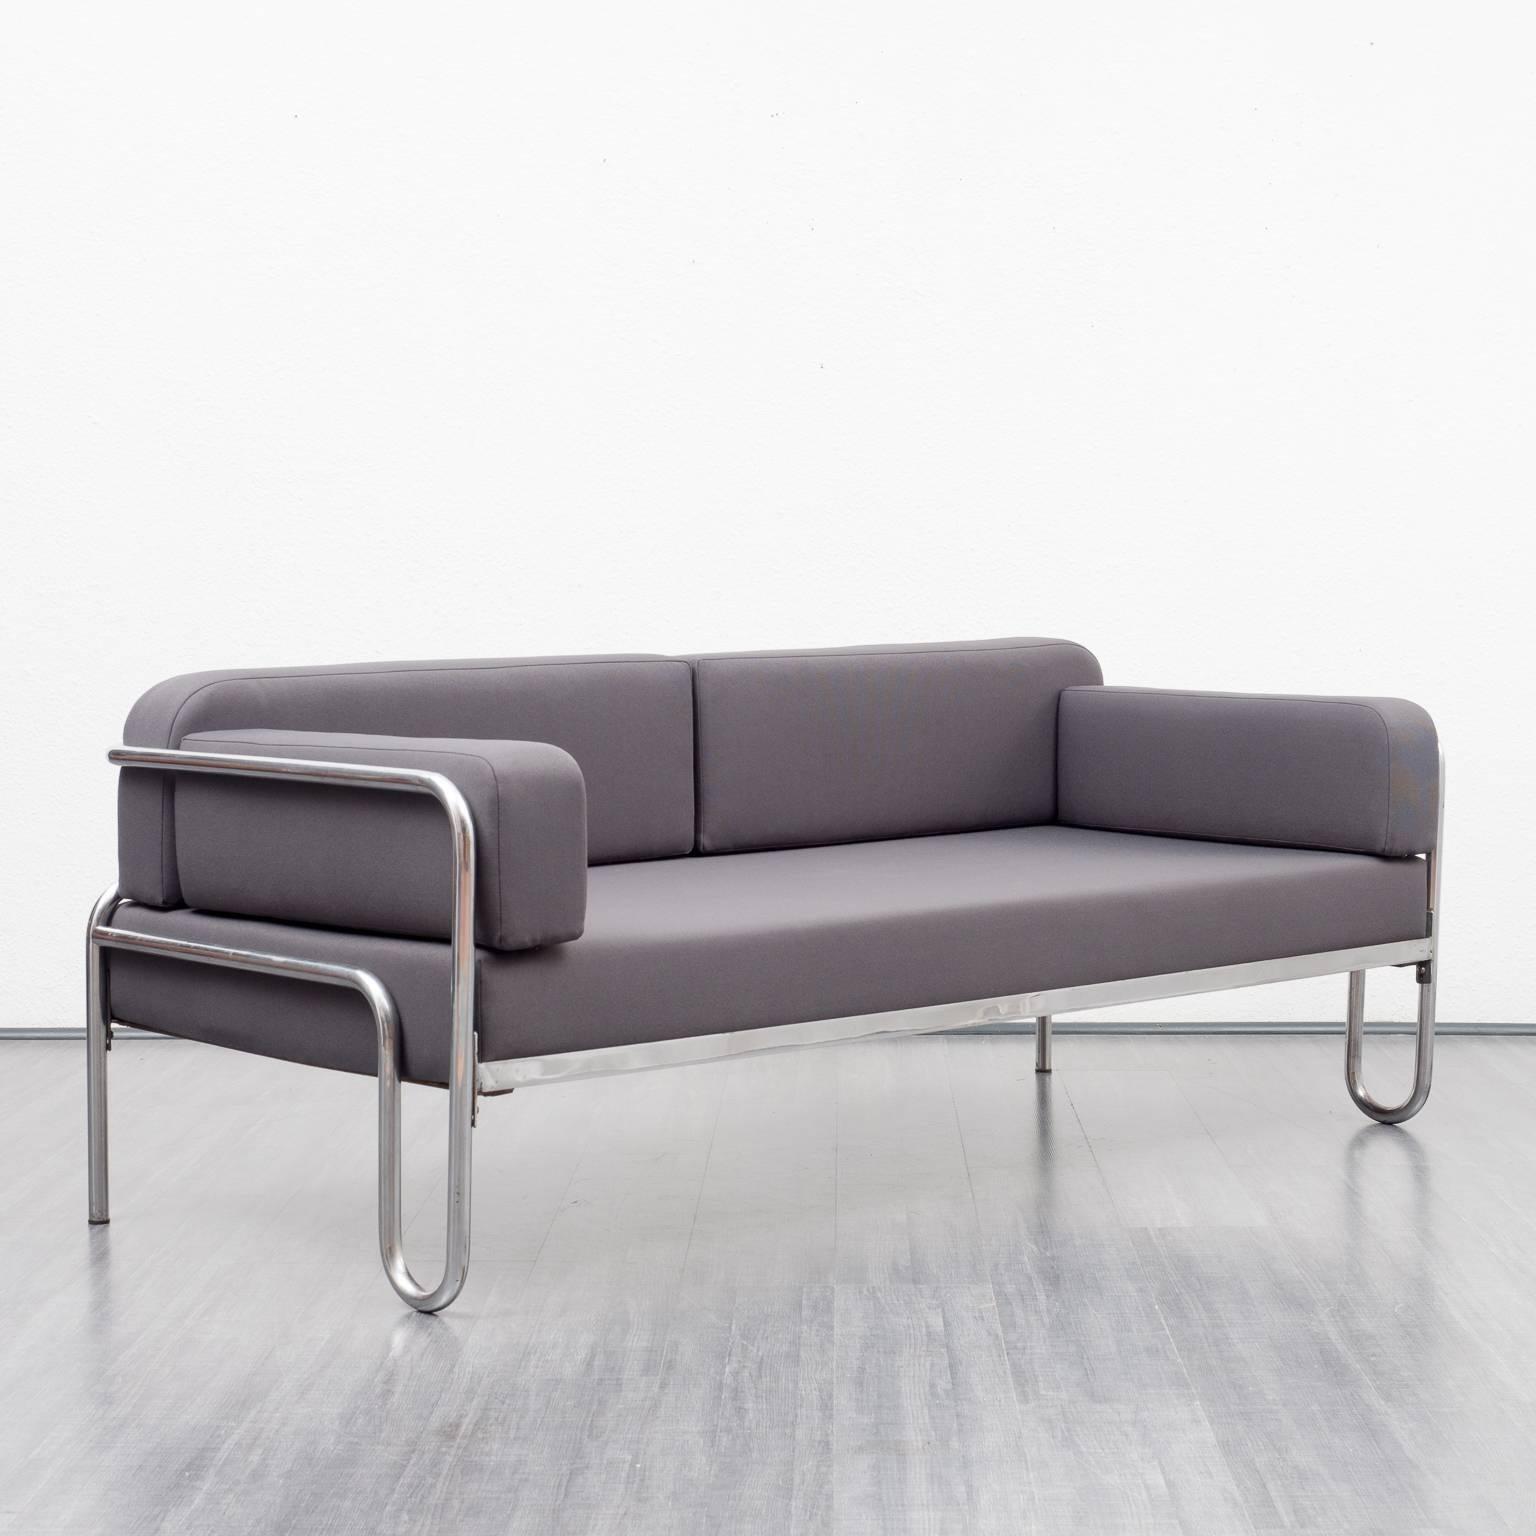 1930s Bauhaus Sofa, New Upholstery, Anthracite Fabric, Tubulair Steel Frame  At 1stdibs